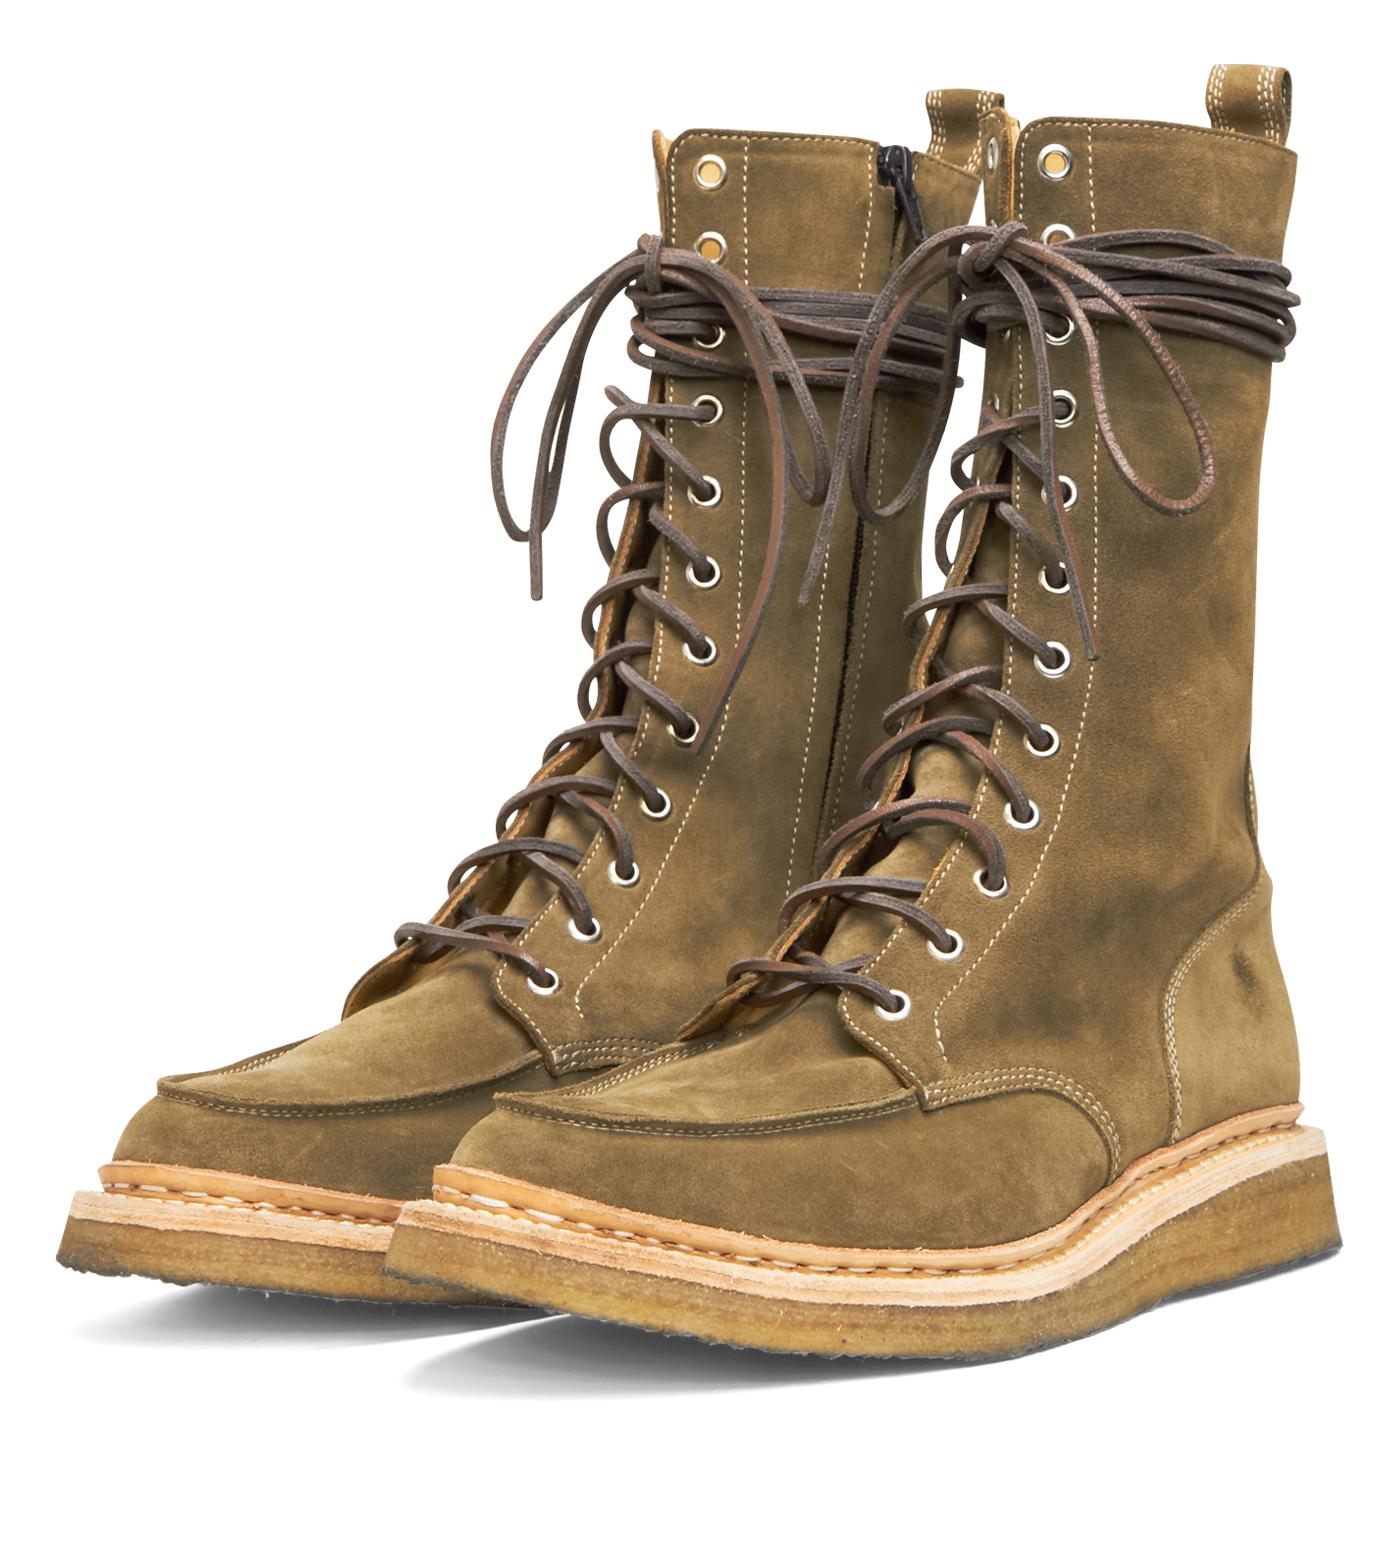 Balmain(バルマン)のRace Up Shoes-BROWN-T954-BA38 拡大詳細画像4